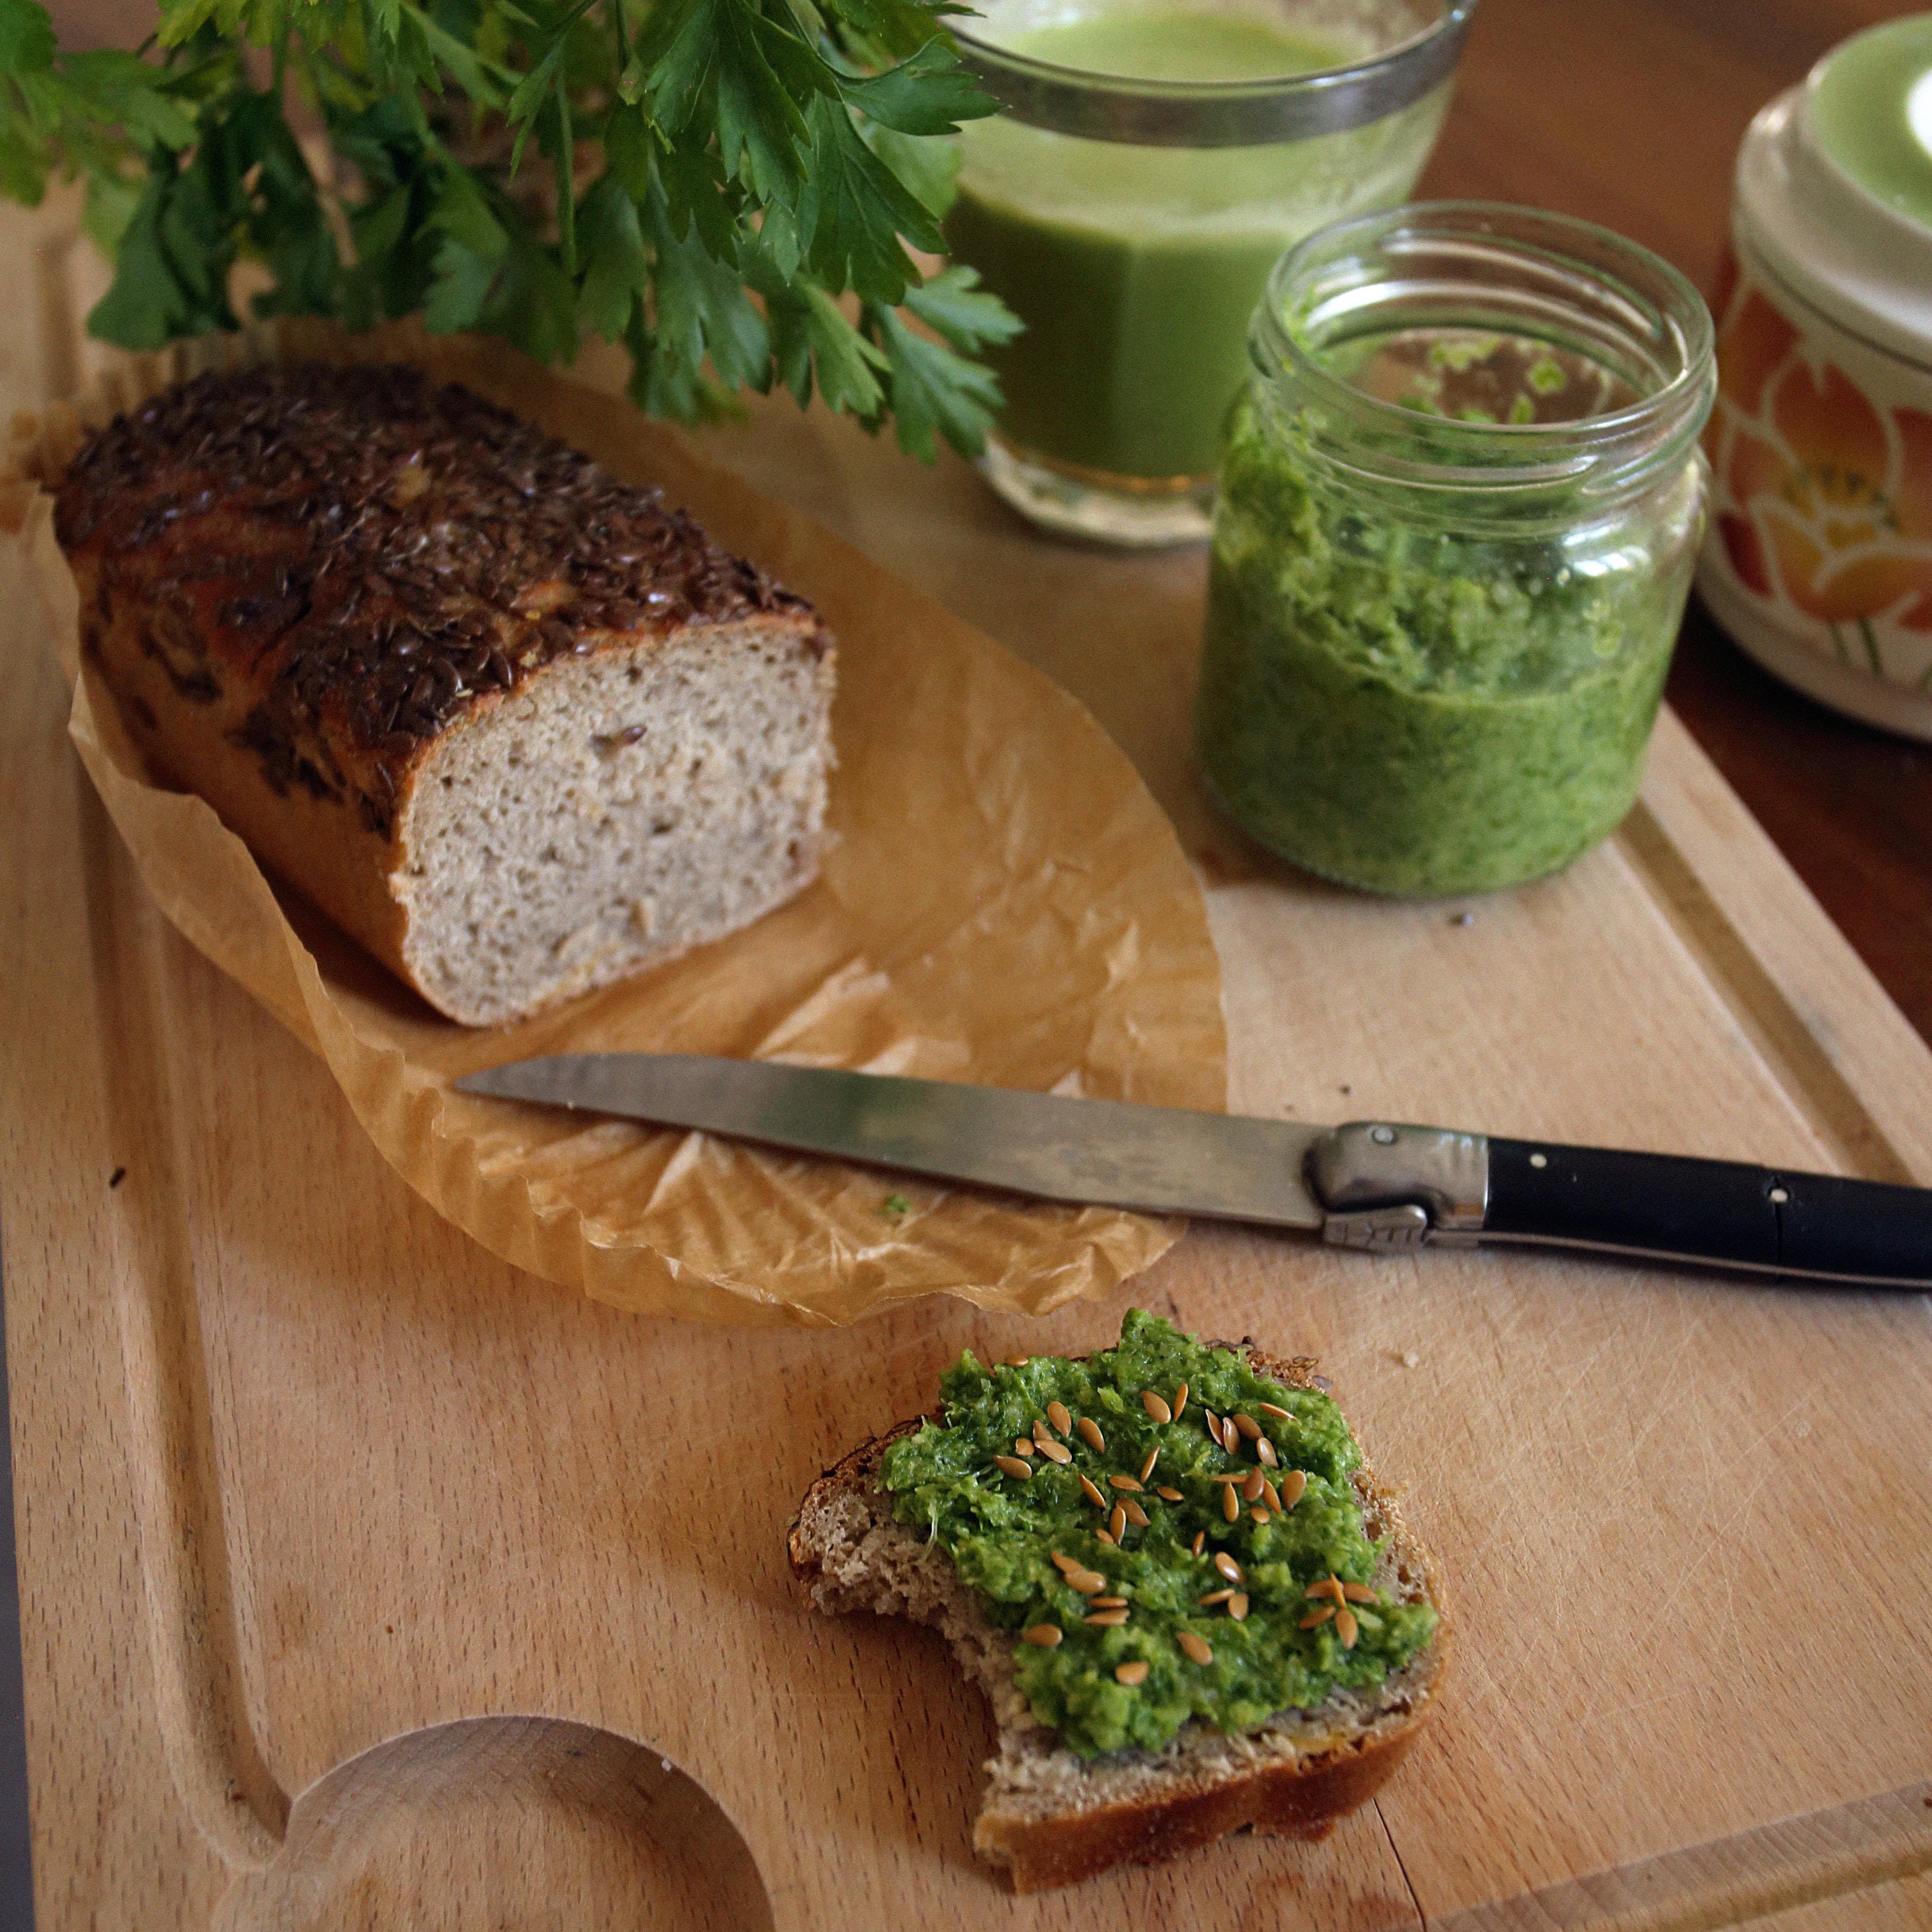 Lady-biche-blog-recette-celeri-12